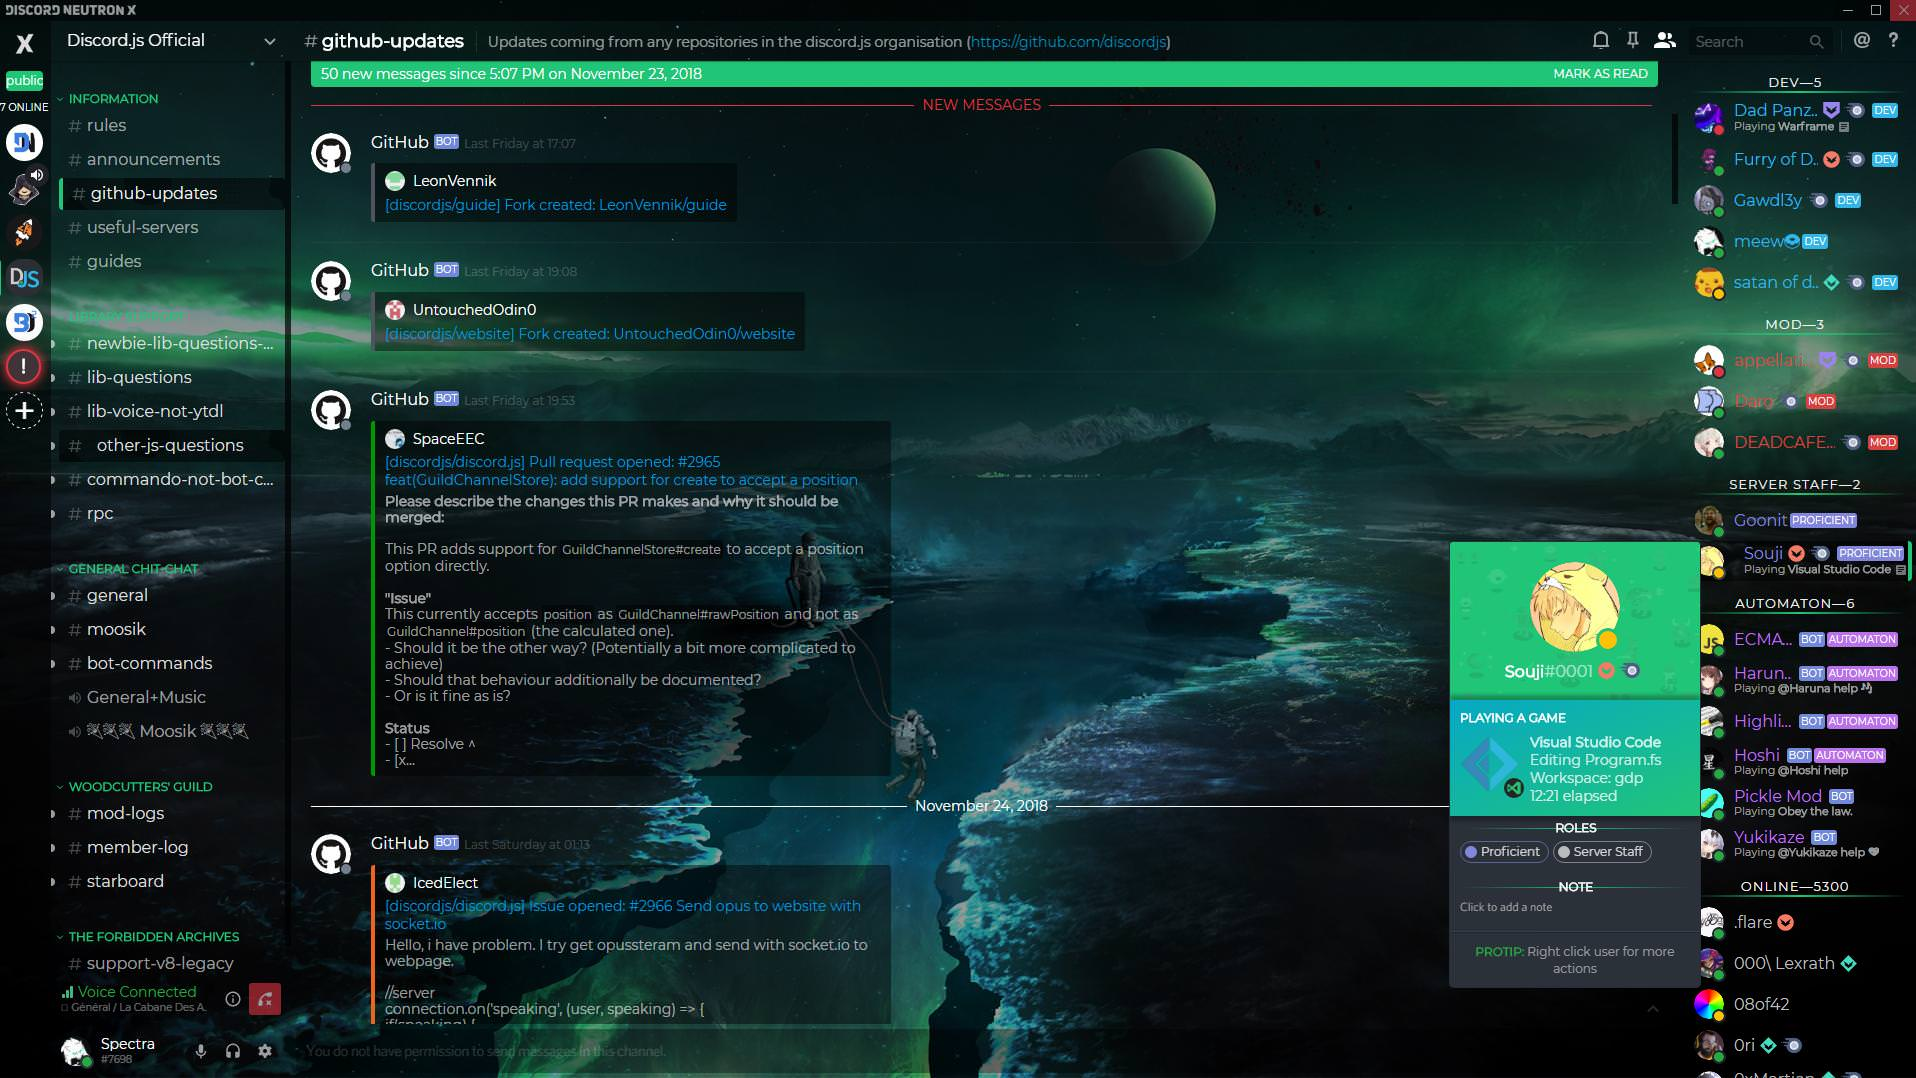 themes/neutron at master · codedotspectra/themes · GitHub